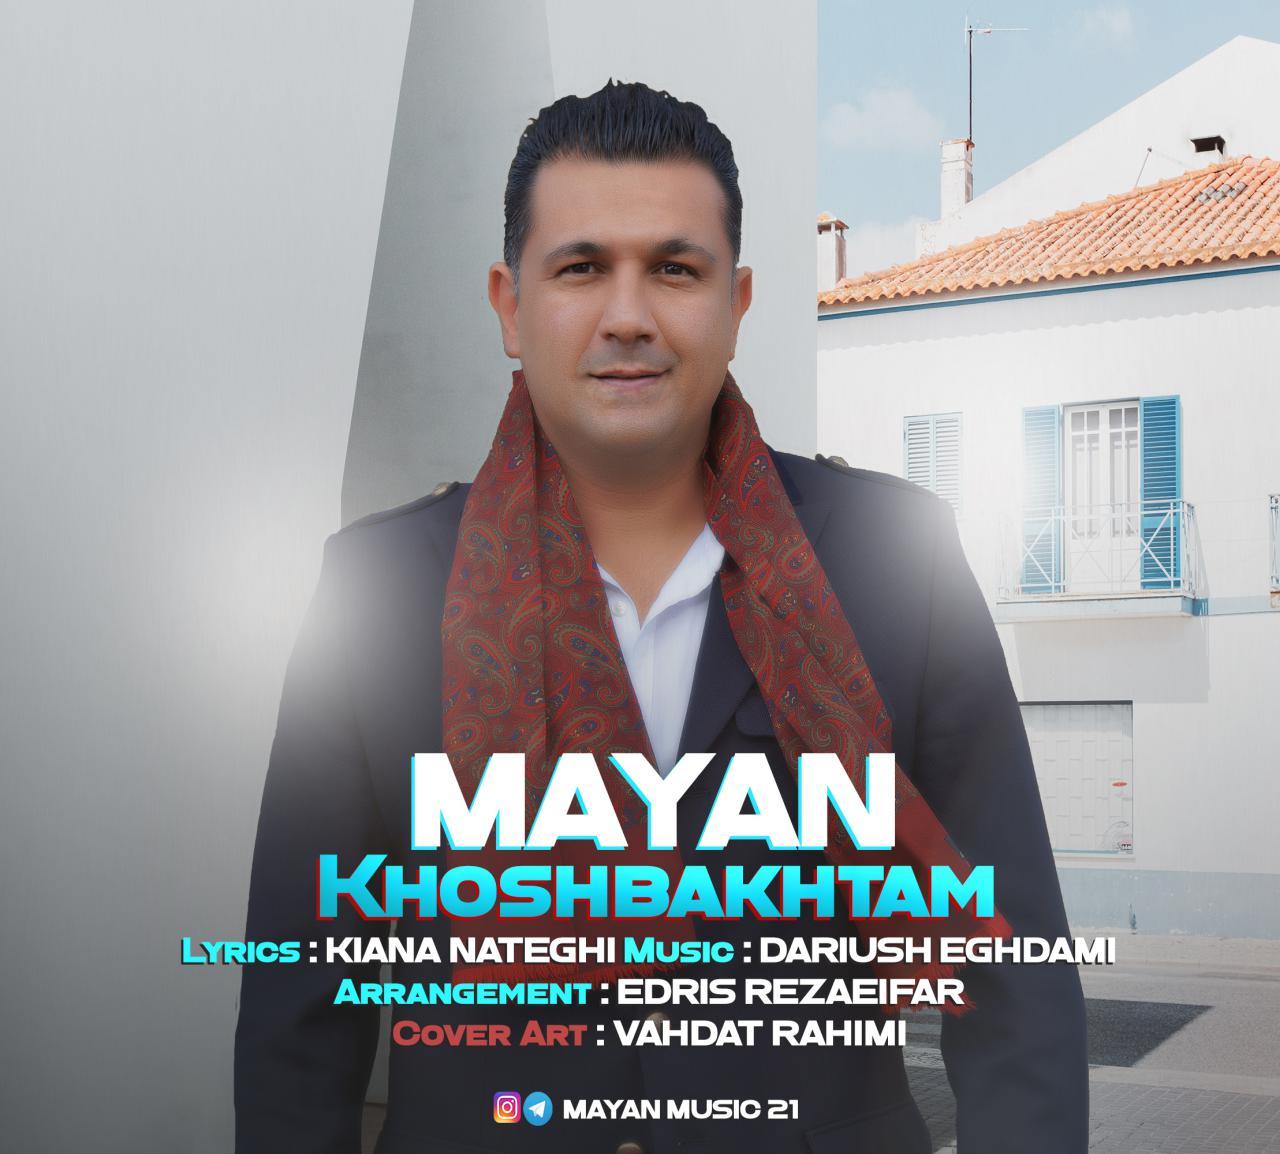 Mayan – Khoshbakhtam